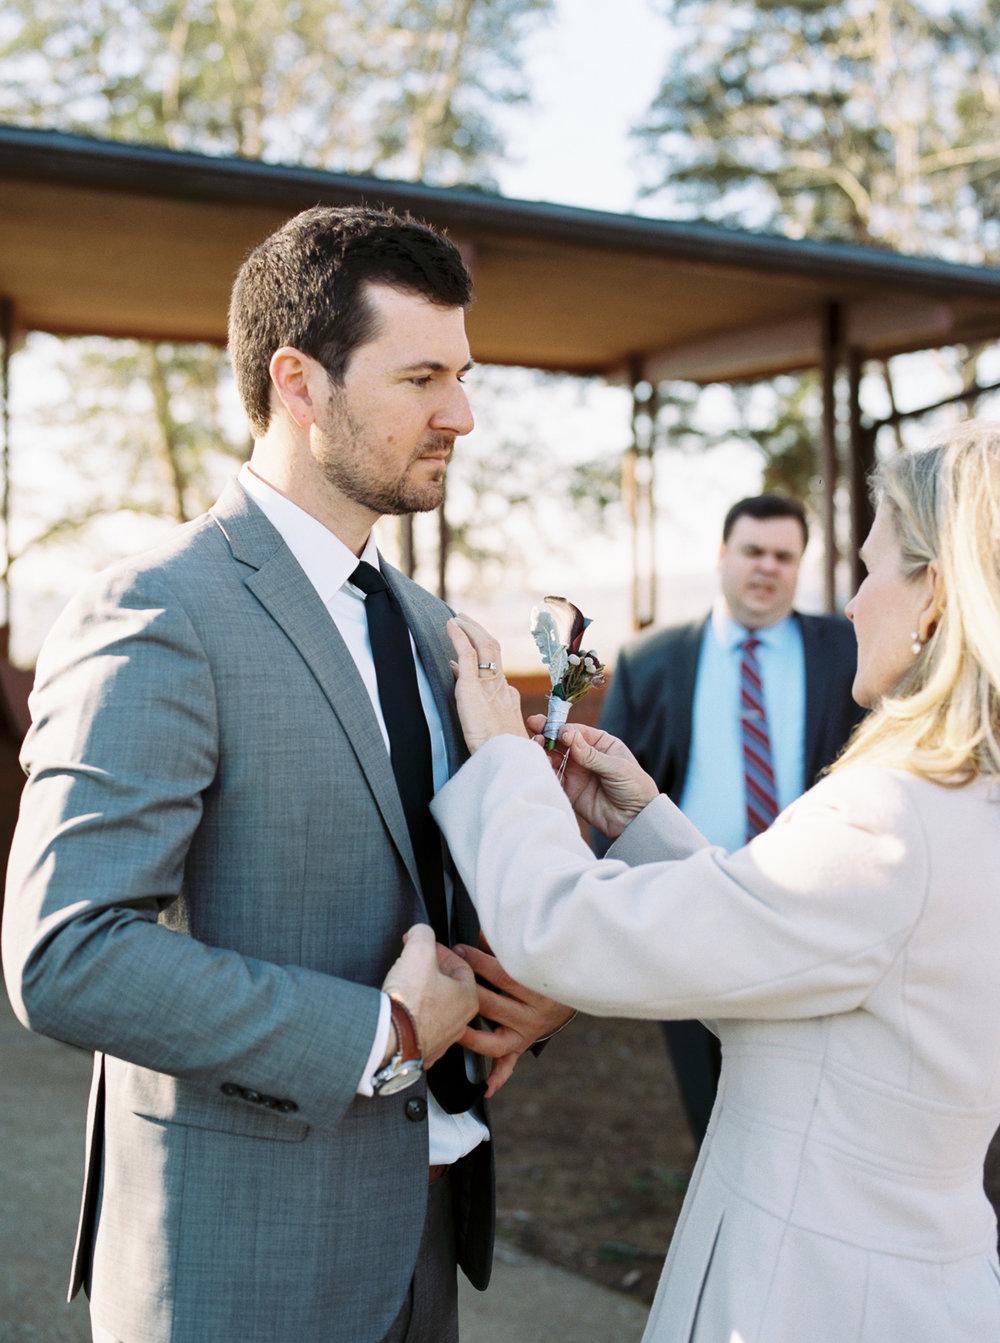 laurel+kelly_natchez_trace_grays_on_main_franklin_film_wedding_photographers©2017abigailbobophotography-1.jpg